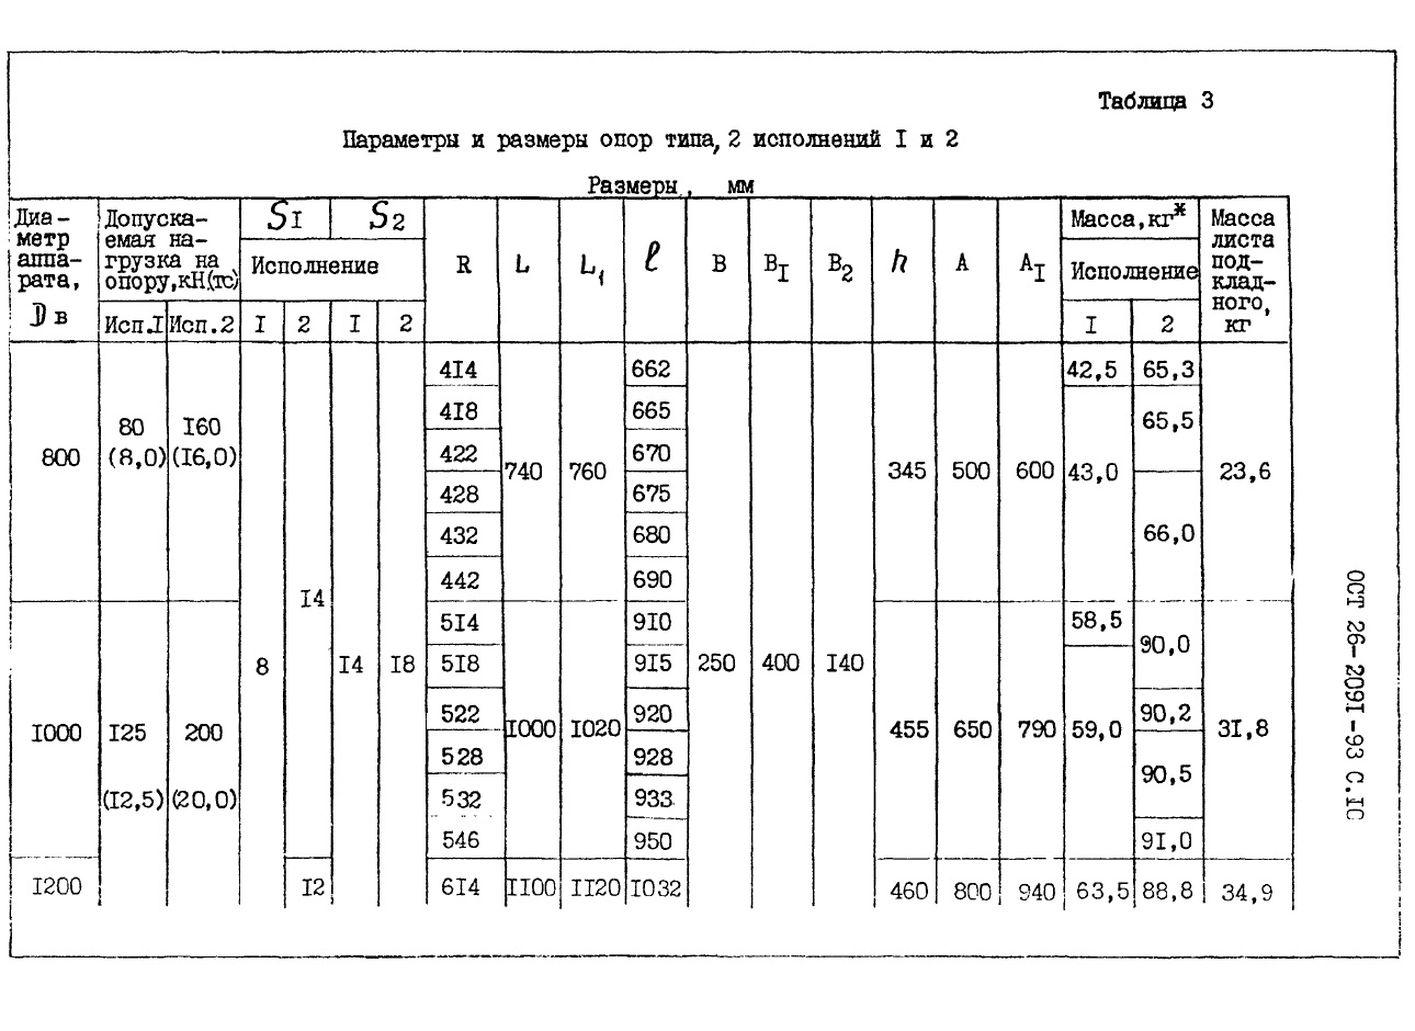 Опоры тип 2 ОСТ 26-2091-93 стр.3